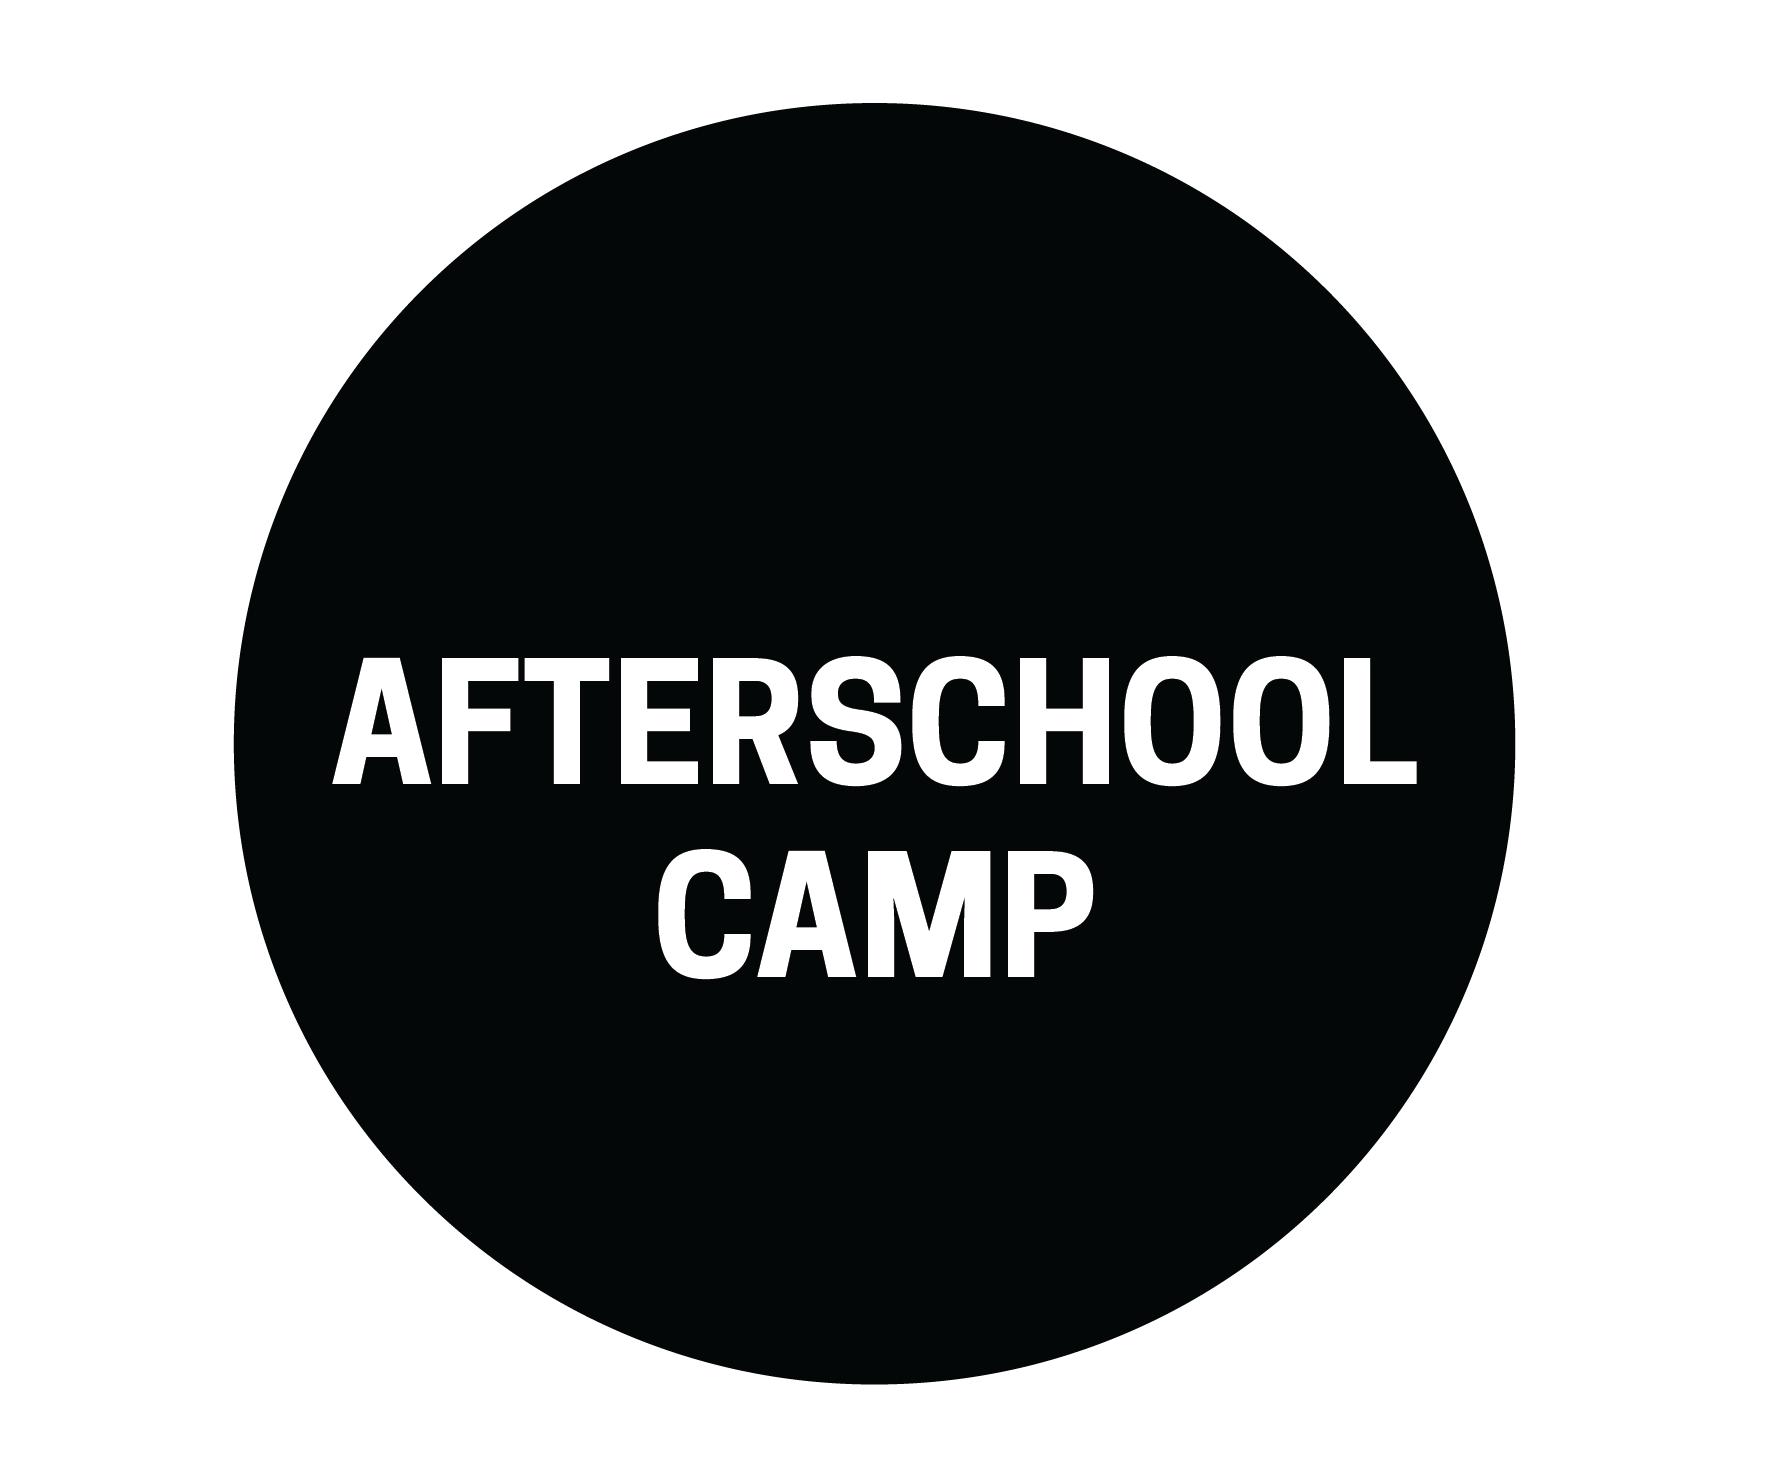 afterschool-01.png